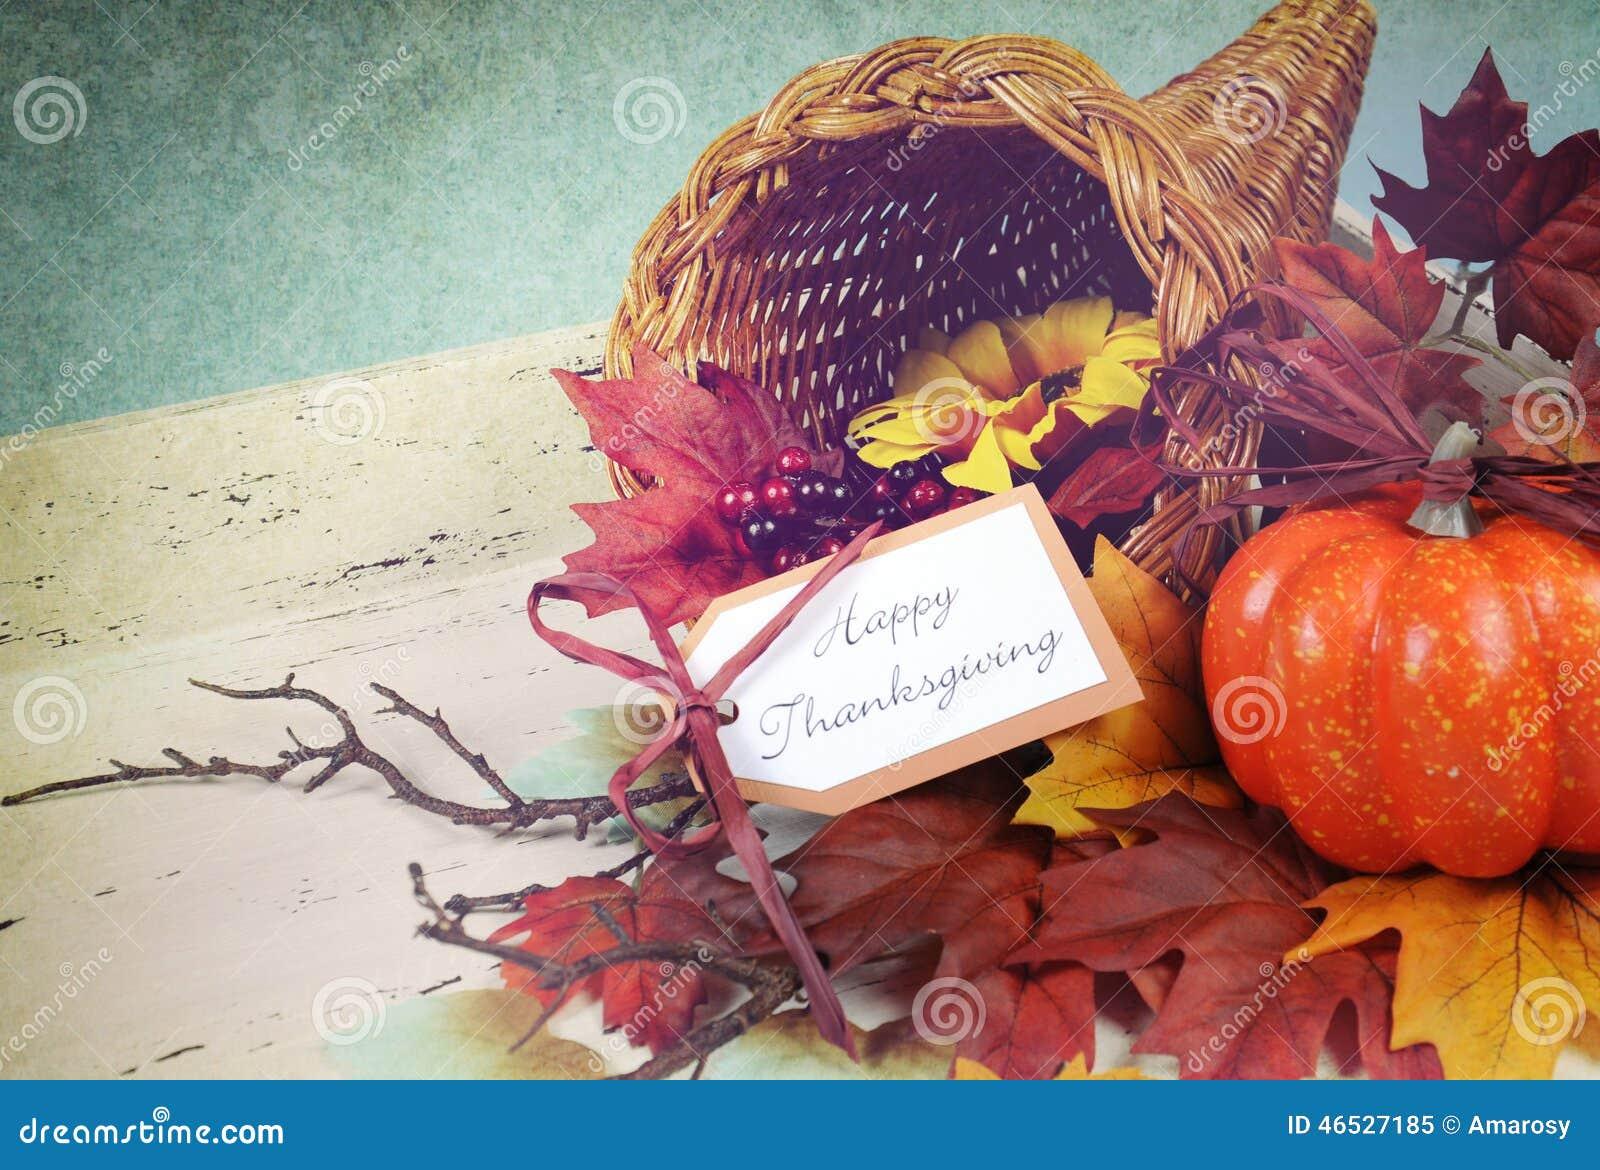 Happy Thanksgiving Cornucopia With Autumn Fall Leaves